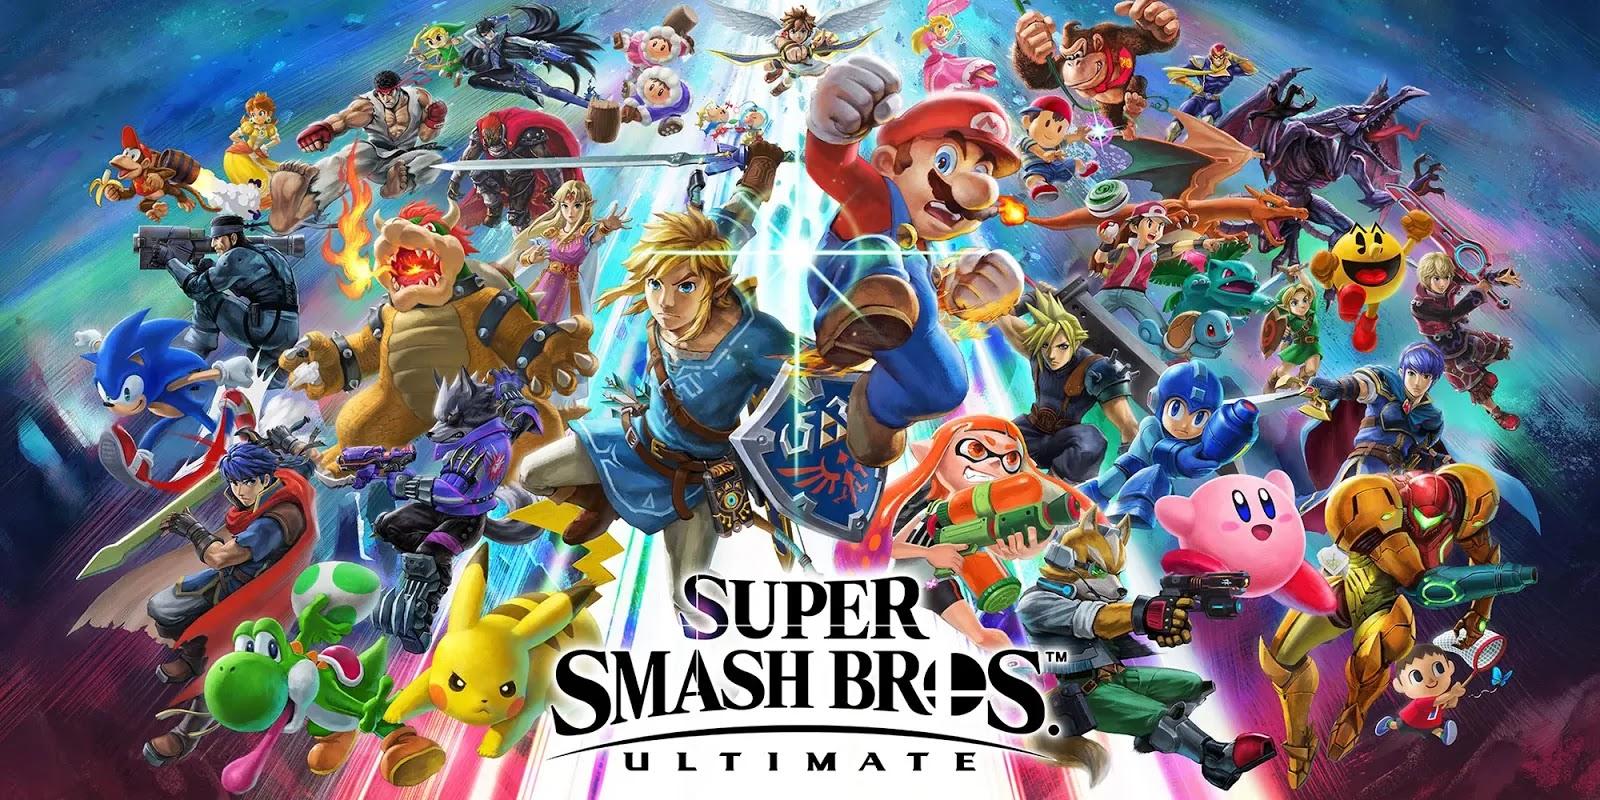 Super Smash Bros Ultimate recibe actualización 8.1.0